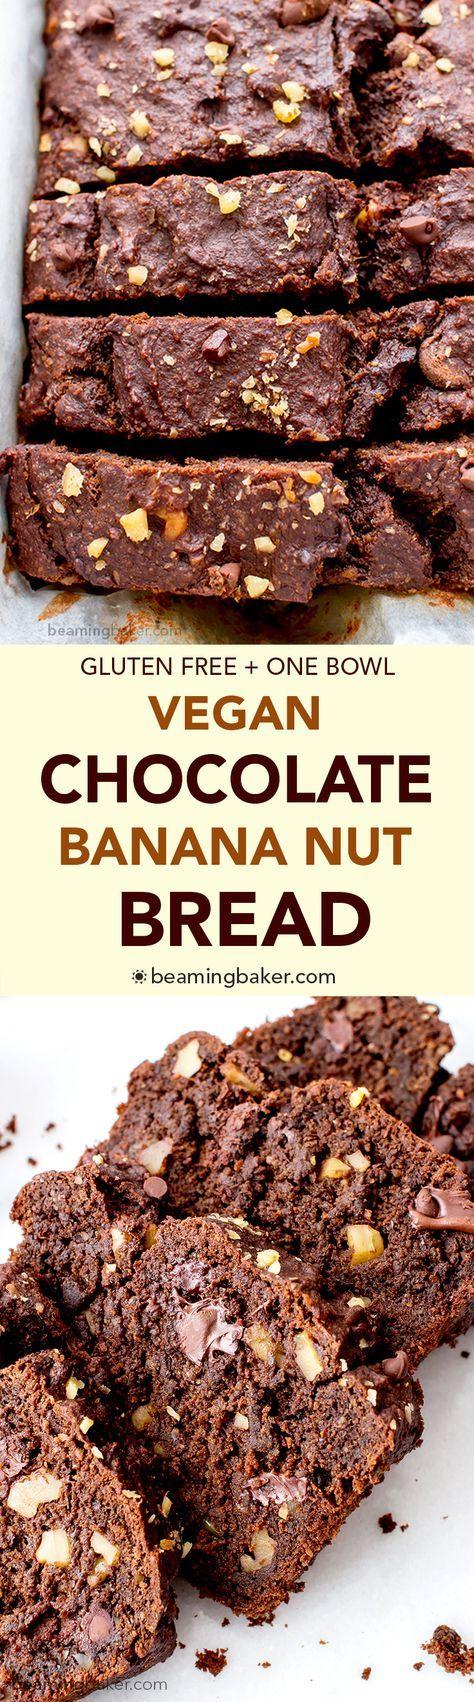 Vegan Chocolate Banana Nut Bread (V+GF): A one bowl recipe for rich, moist and chocolatey banana bread with walnuts. #Vegan #GlutenFree | http://BeamingBaker.com